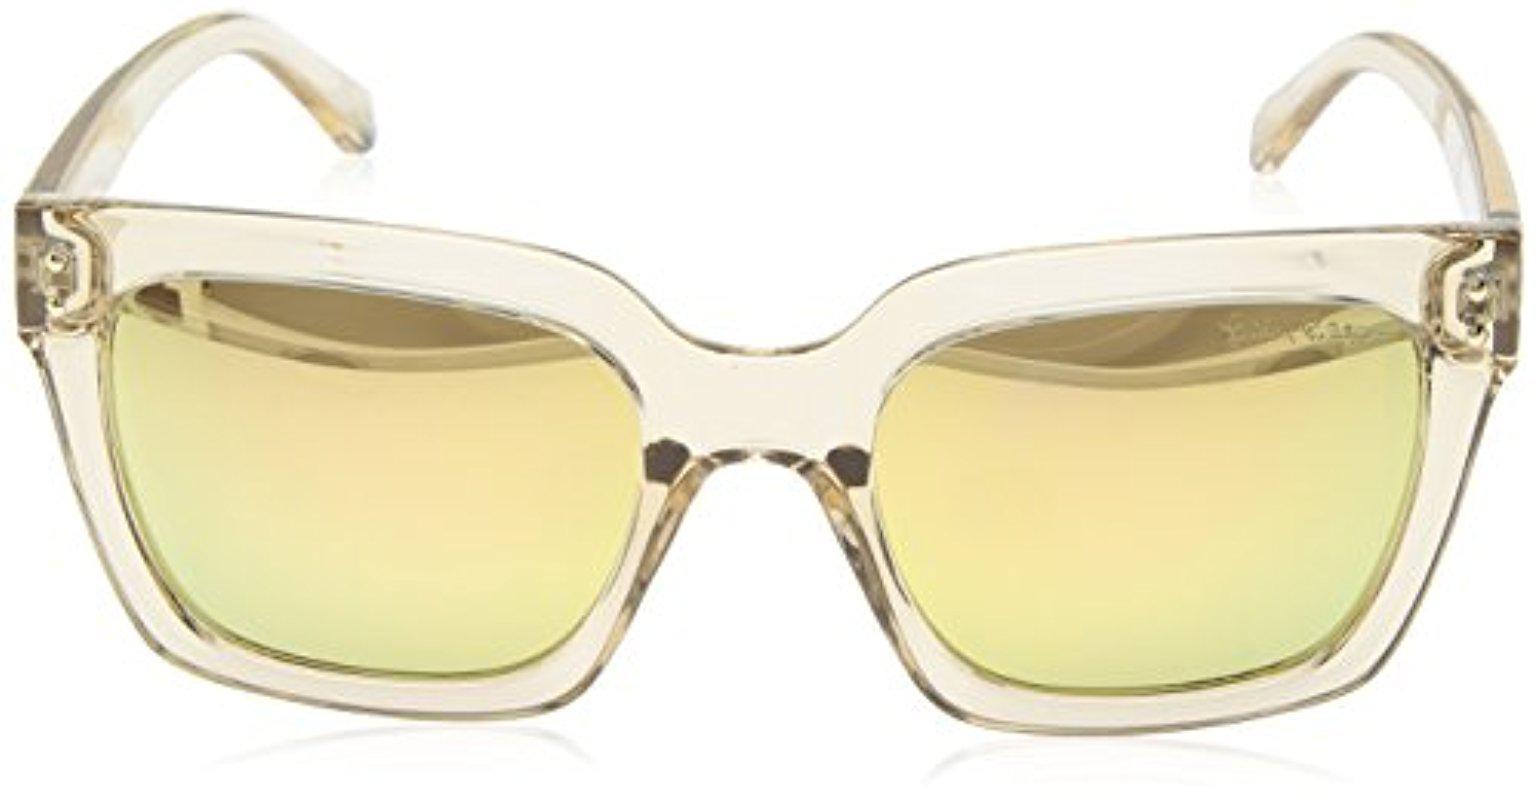 12daf890b4 Lyst - Lilly Pulitzer Celine Polarized Square Sunglasses